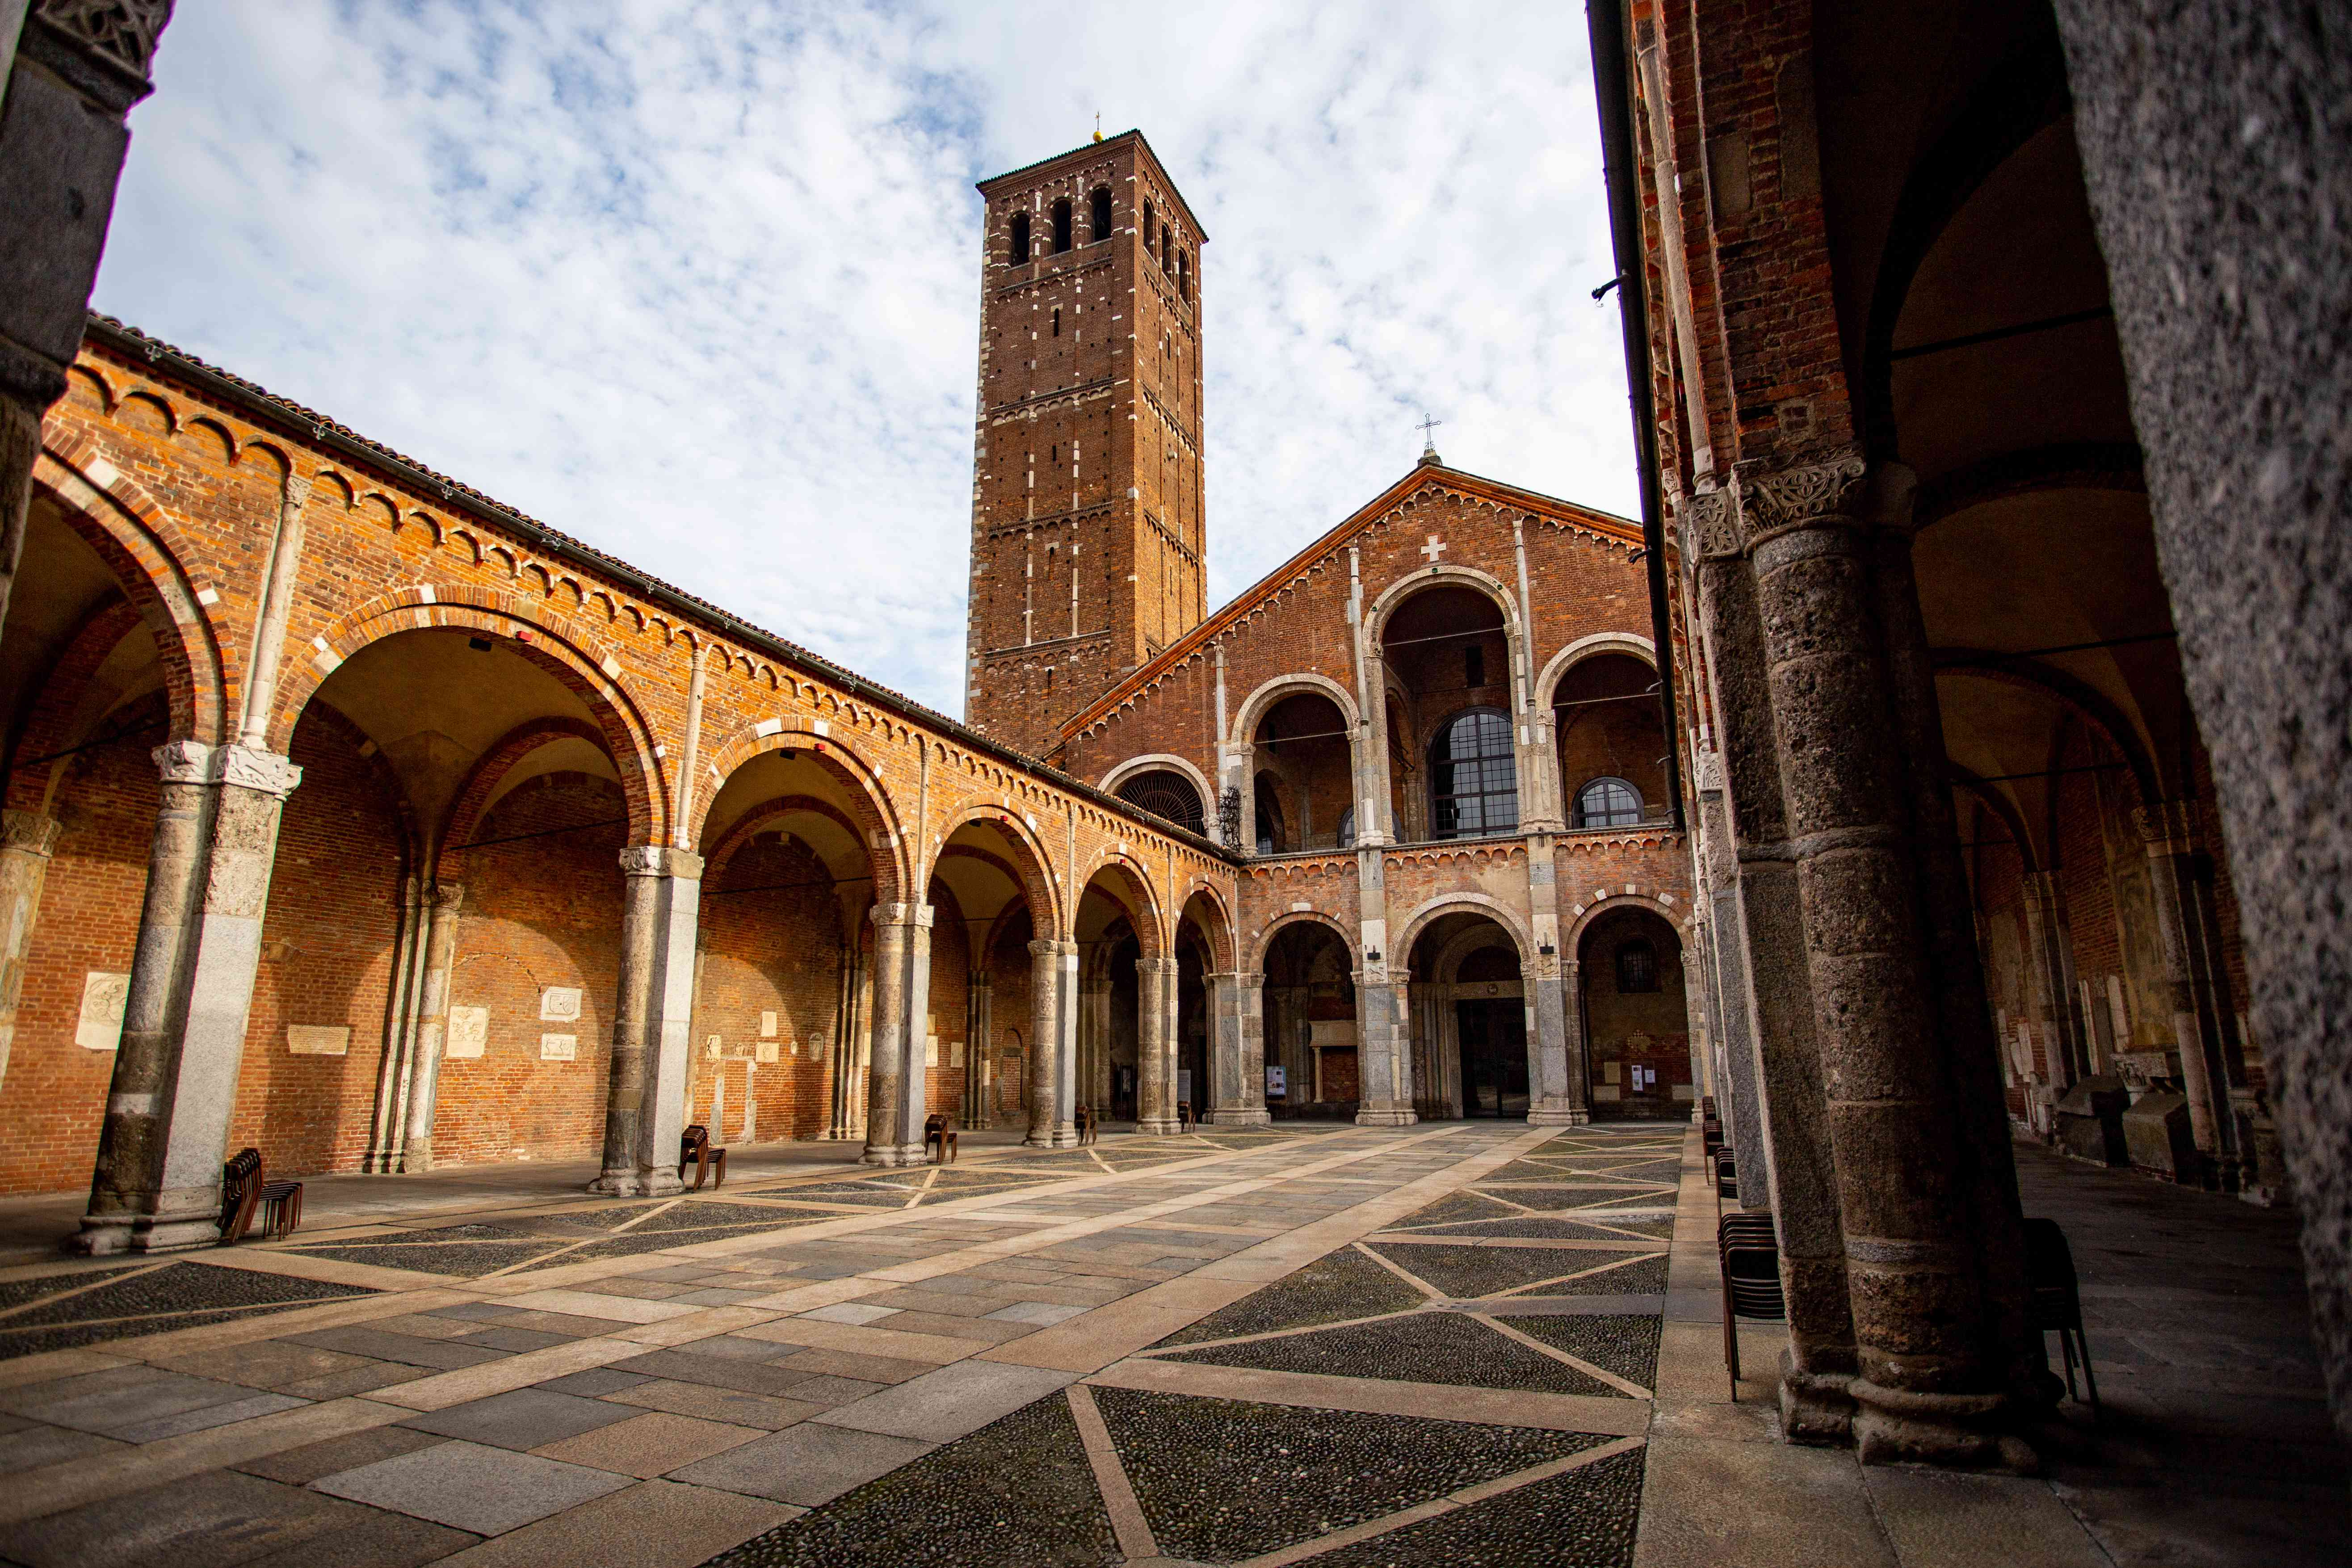 Basilica di Sant'Ambrogio in Milan